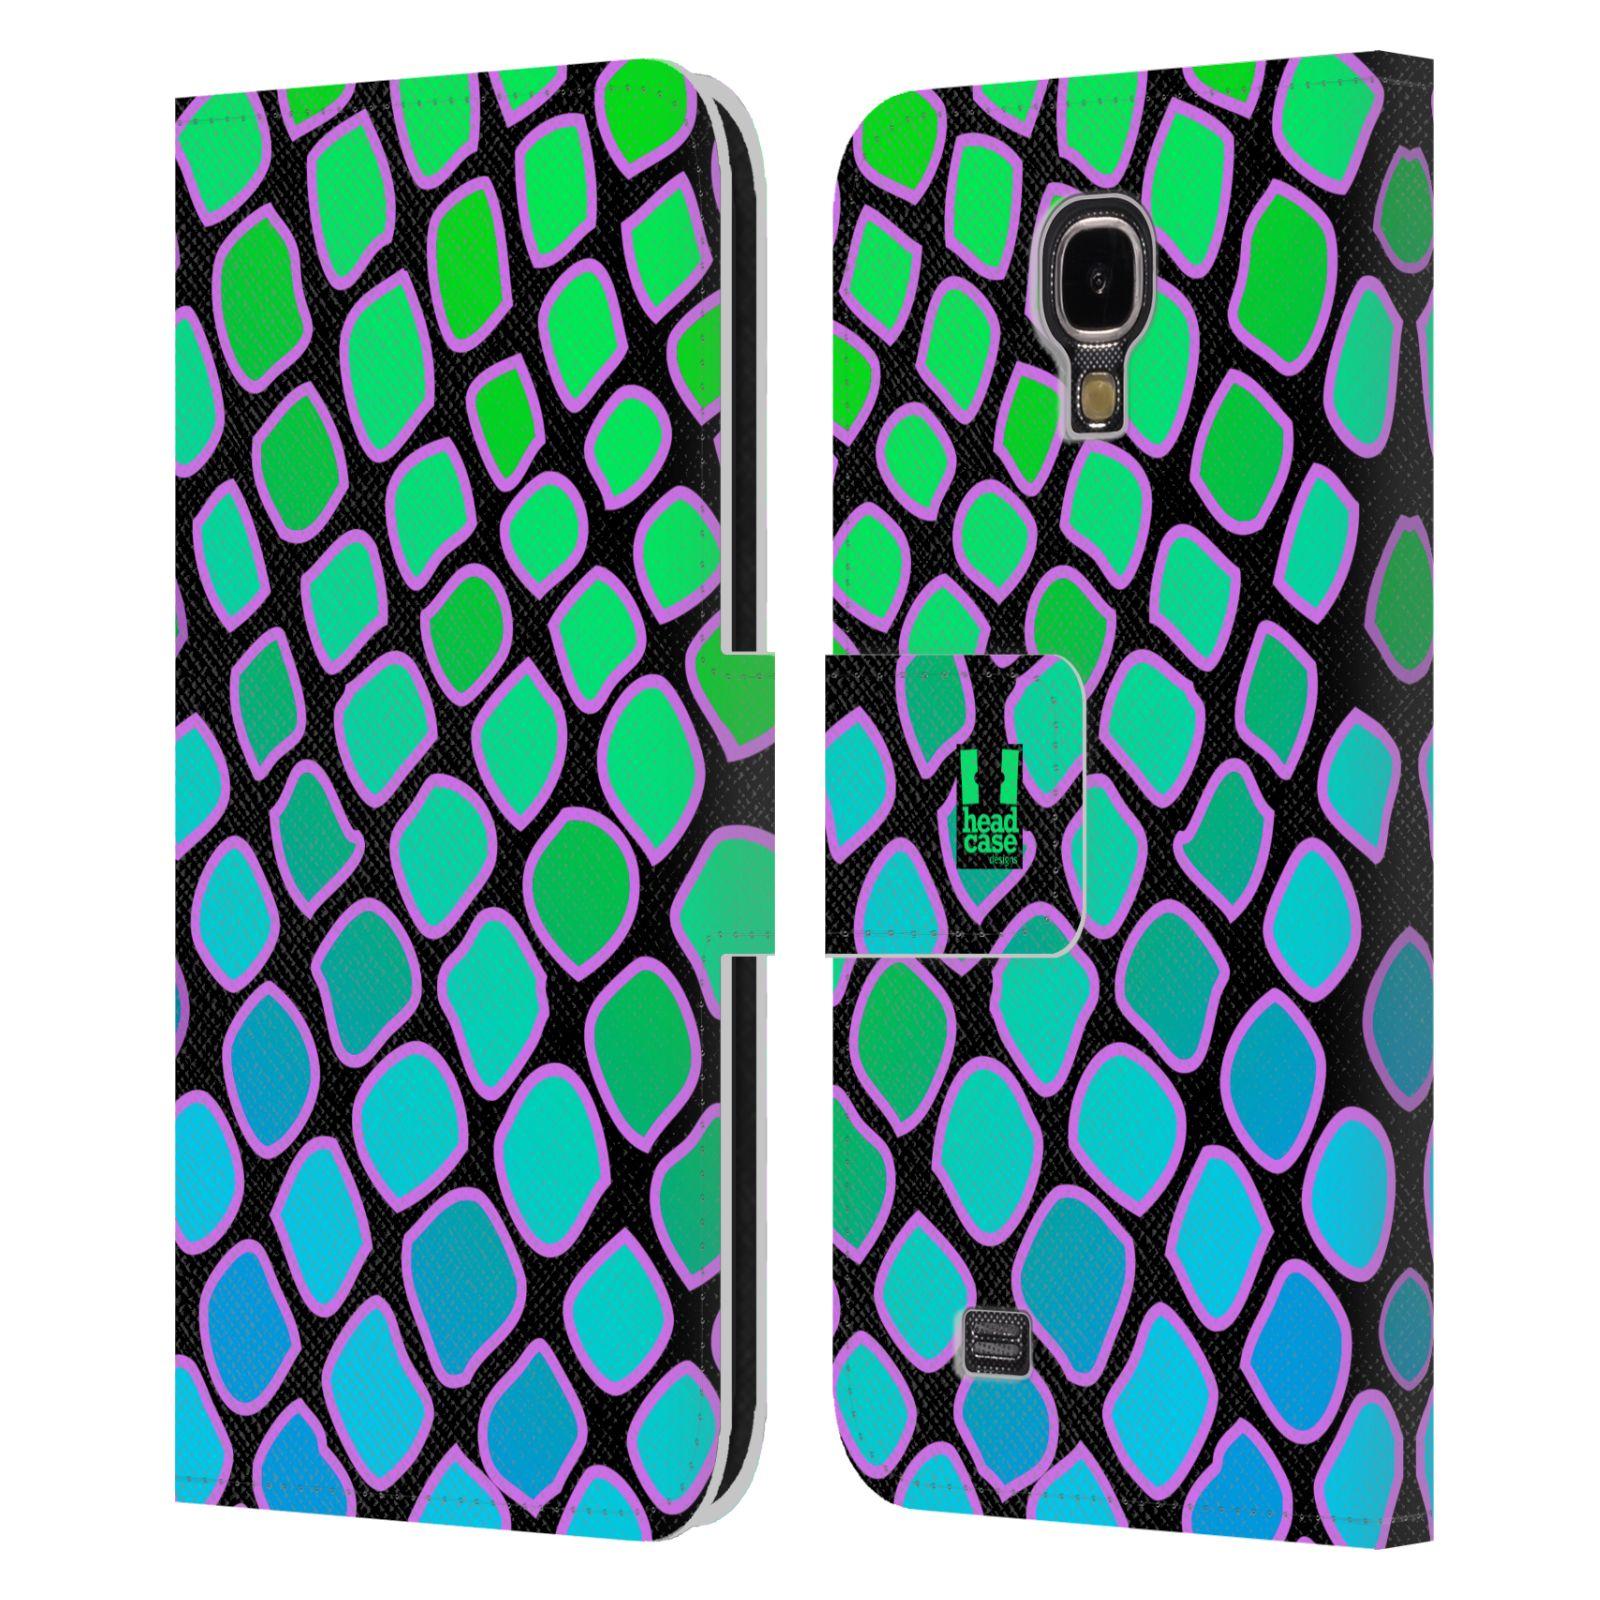 HEAD CASE Flipové pouzdro pro mobil Samsung Galaxy S4 Zvířecí barevné vzory vodní had modrá a zelená barva AQUA